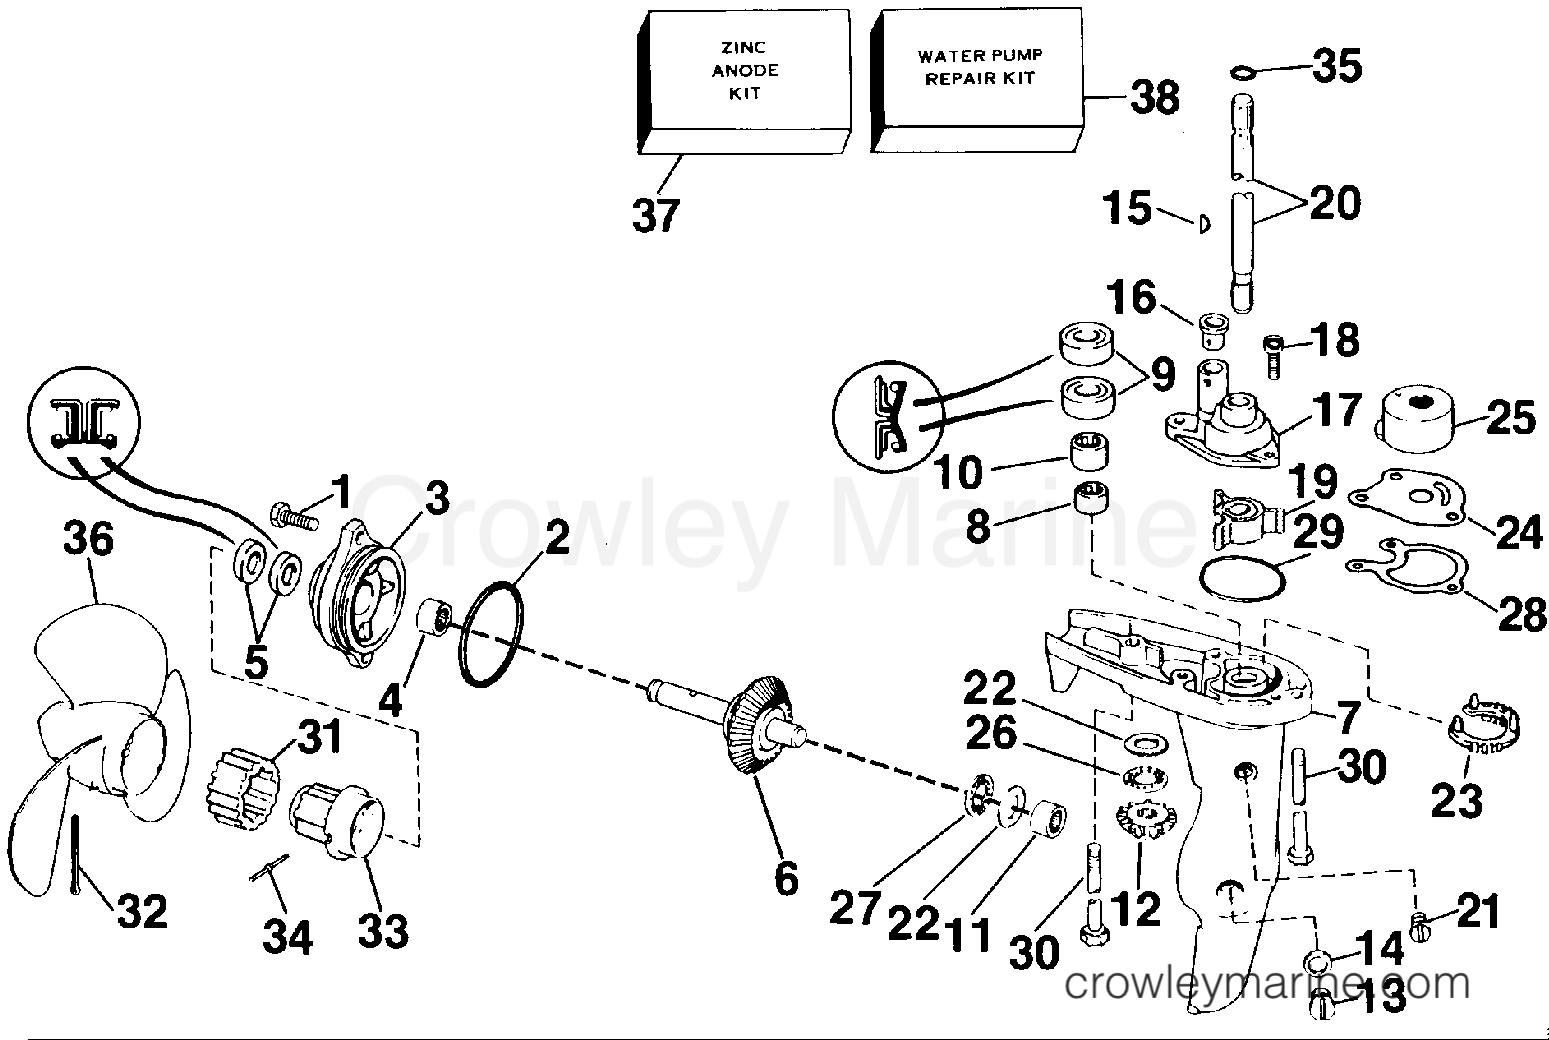 gearcase - 3rc models